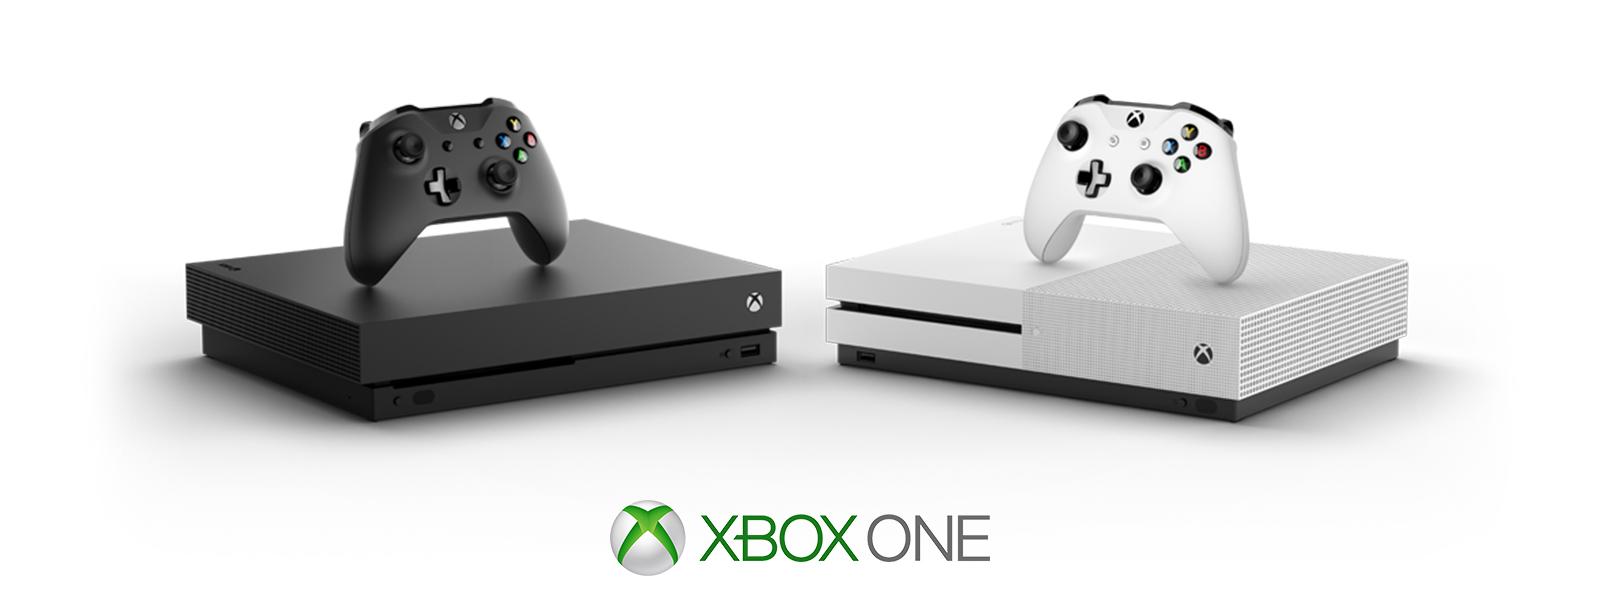 Xbox One X 和 Xbox One S